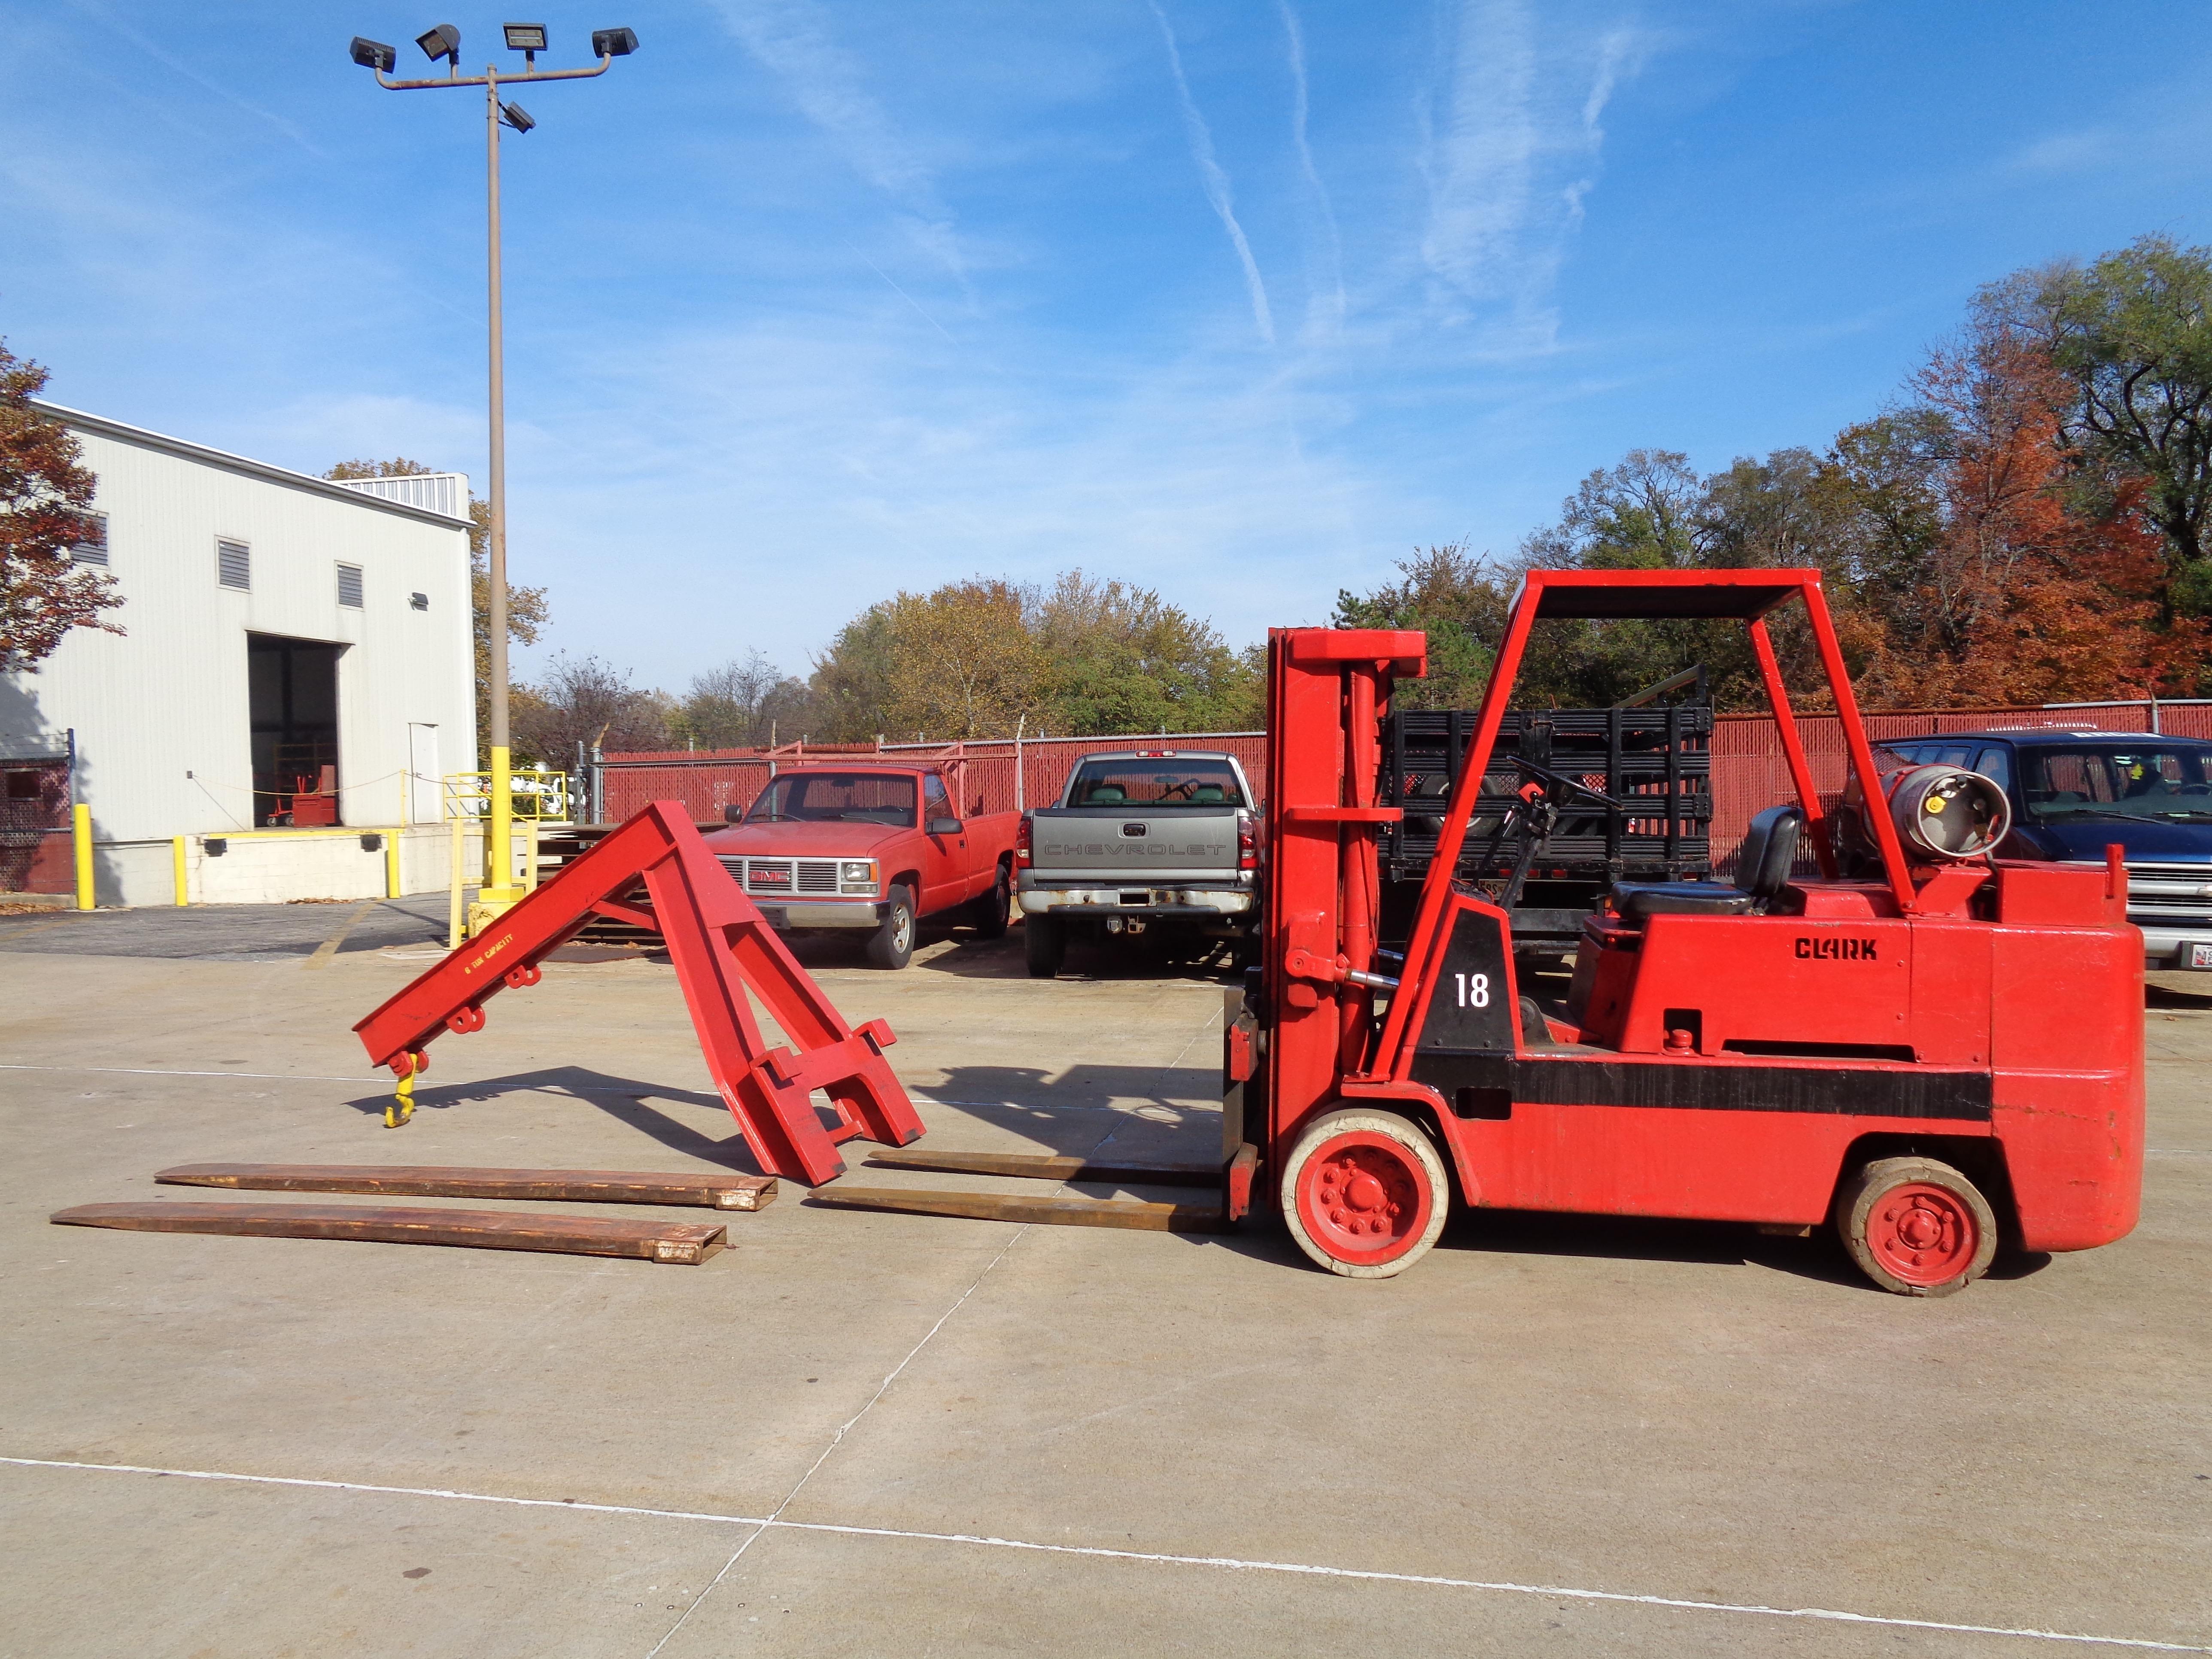 Clark C500-135 Forklift plus Boom- 14,000 lbs - Image 3 of 11